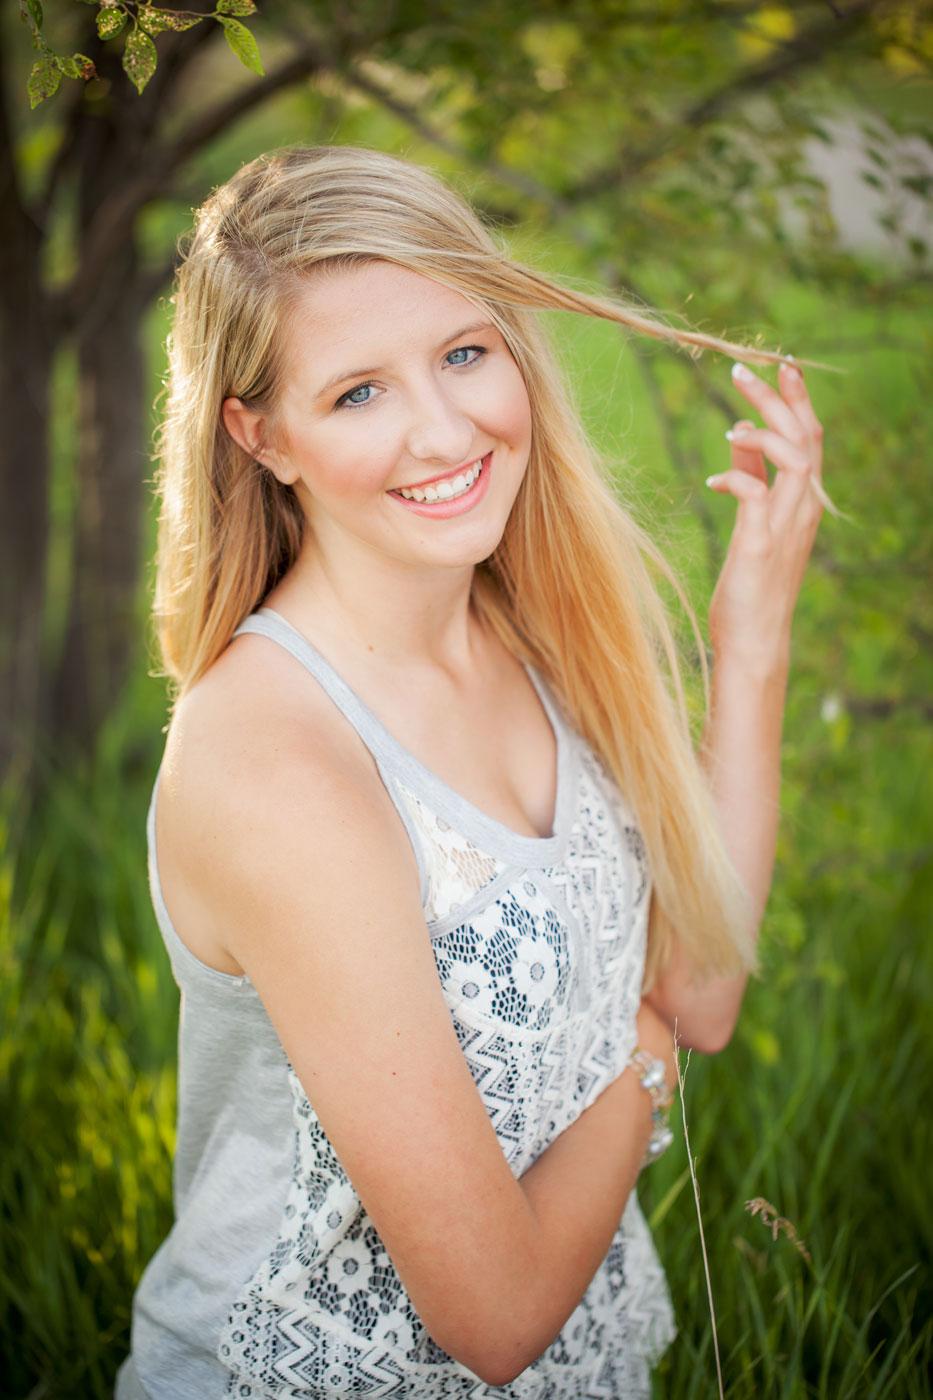 Russtanna_Photography_2014_Catie-37.jpg